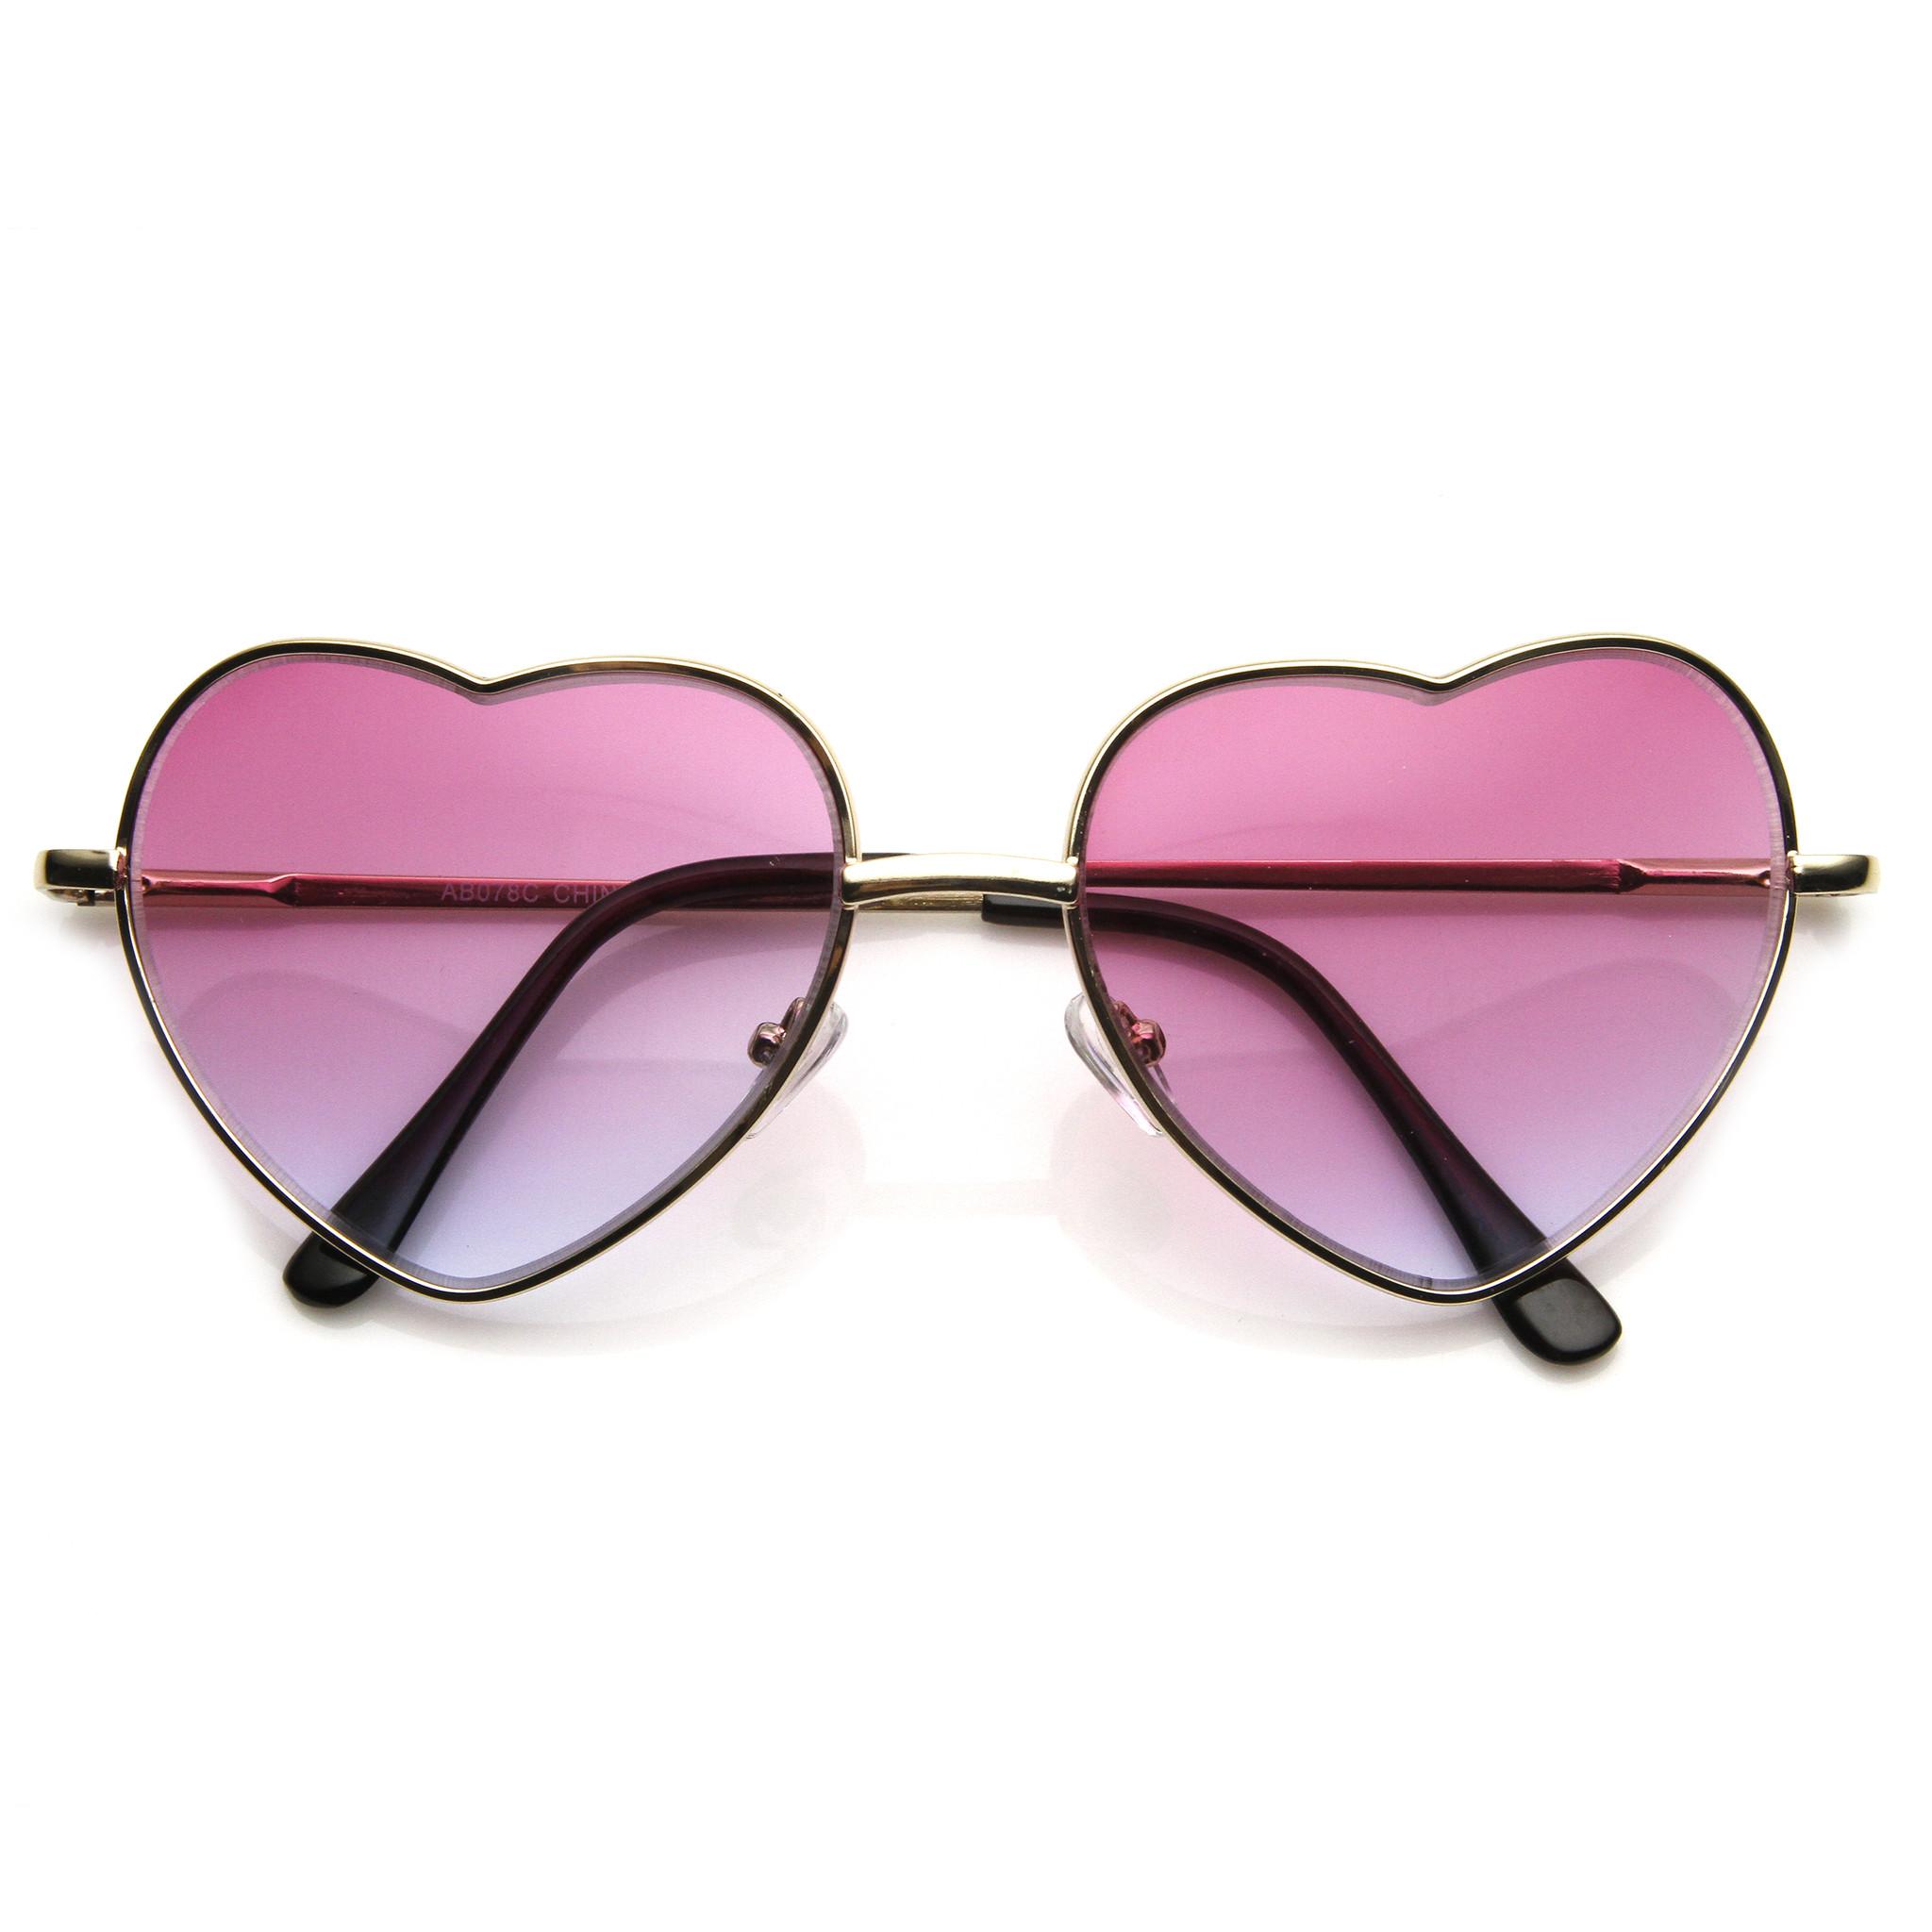 Super Cute Retro Metal Heart Shape Sunglasses With Rainbow Color Lens 9205